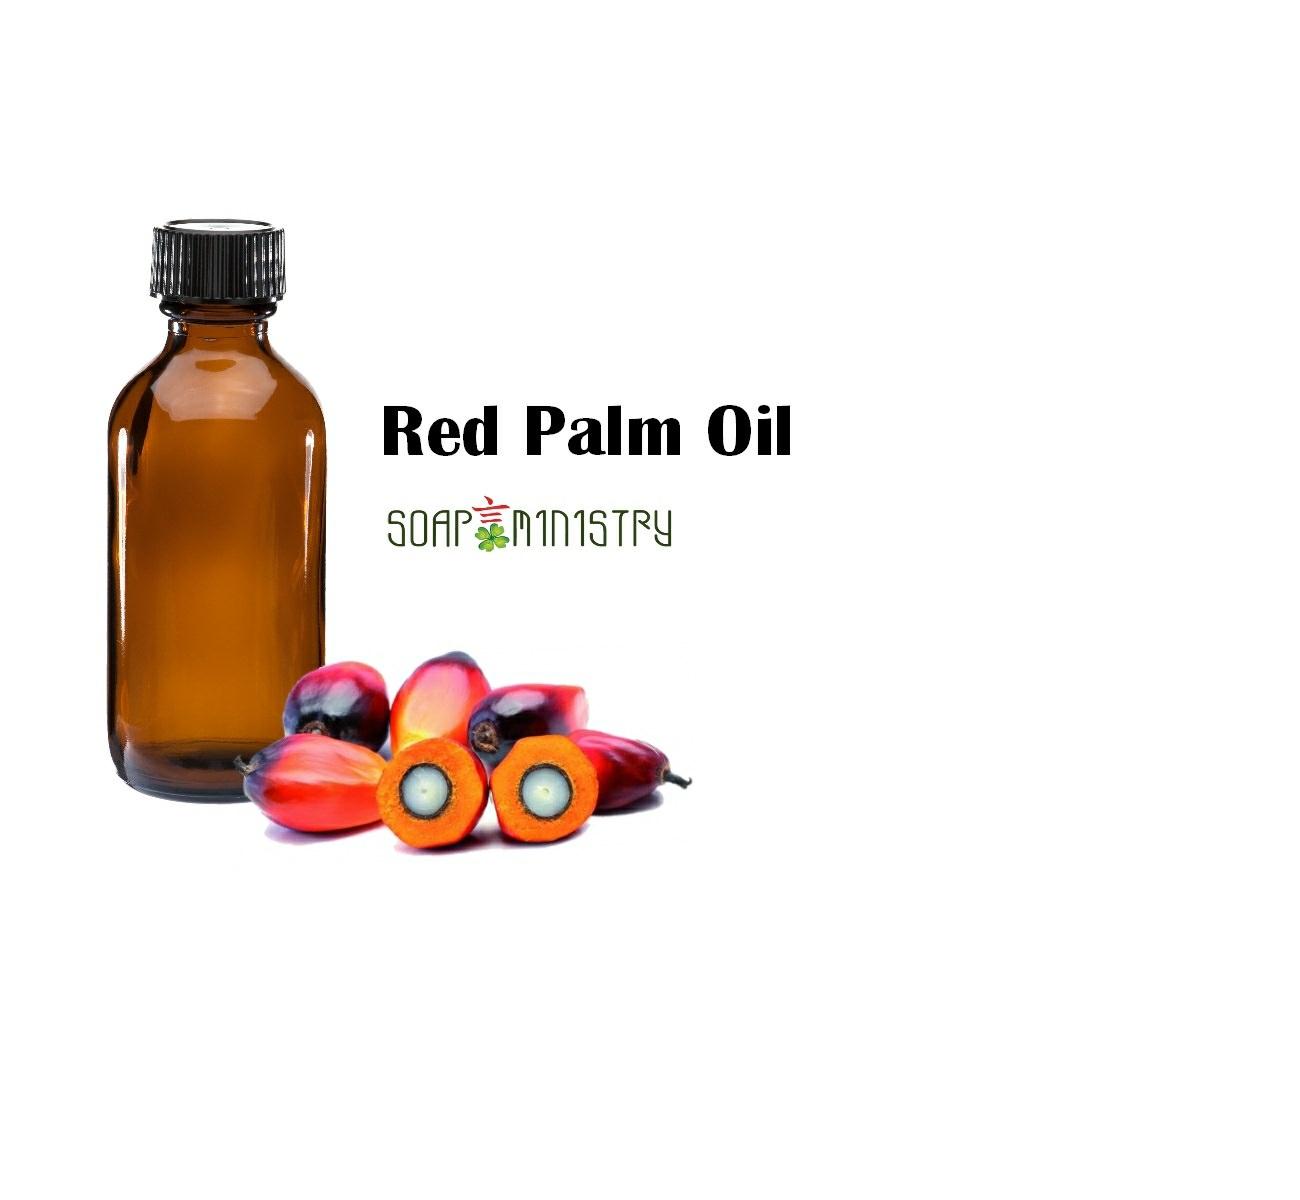 Red Palm Oil 1L